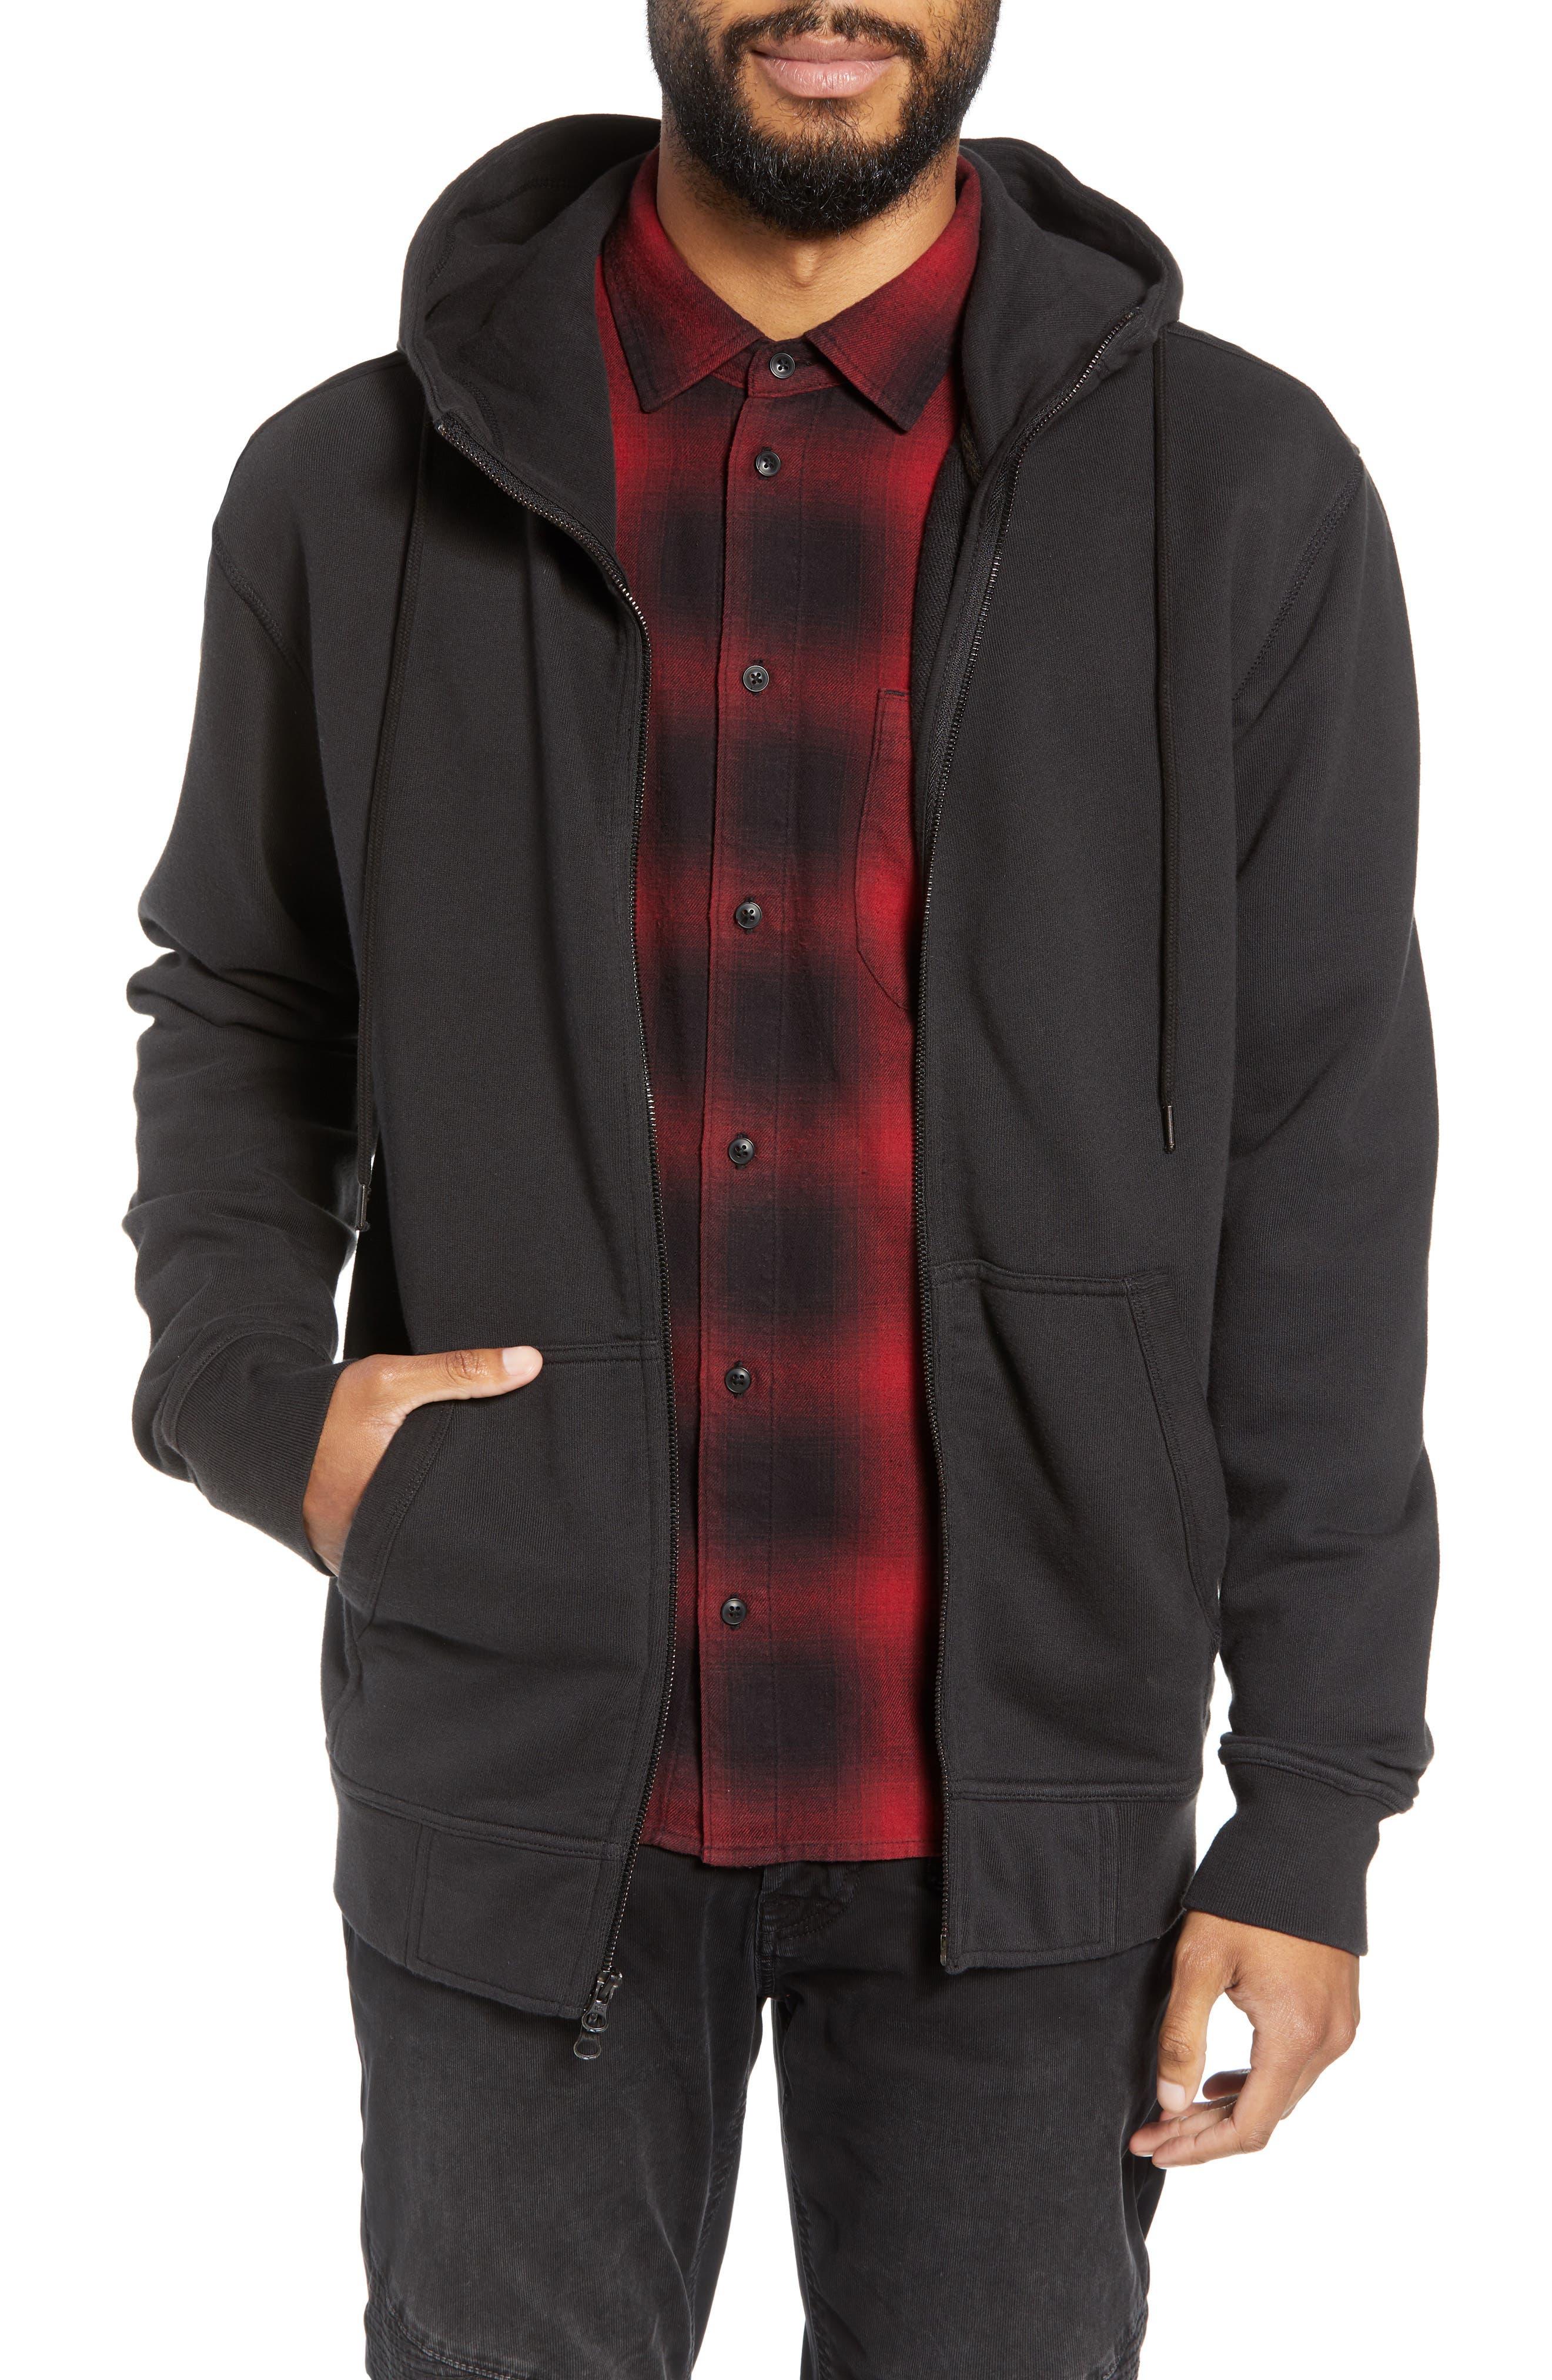 Regular Fit Hooded Zip Sweatshirt,                             Main thumbnail 1, color,                             001